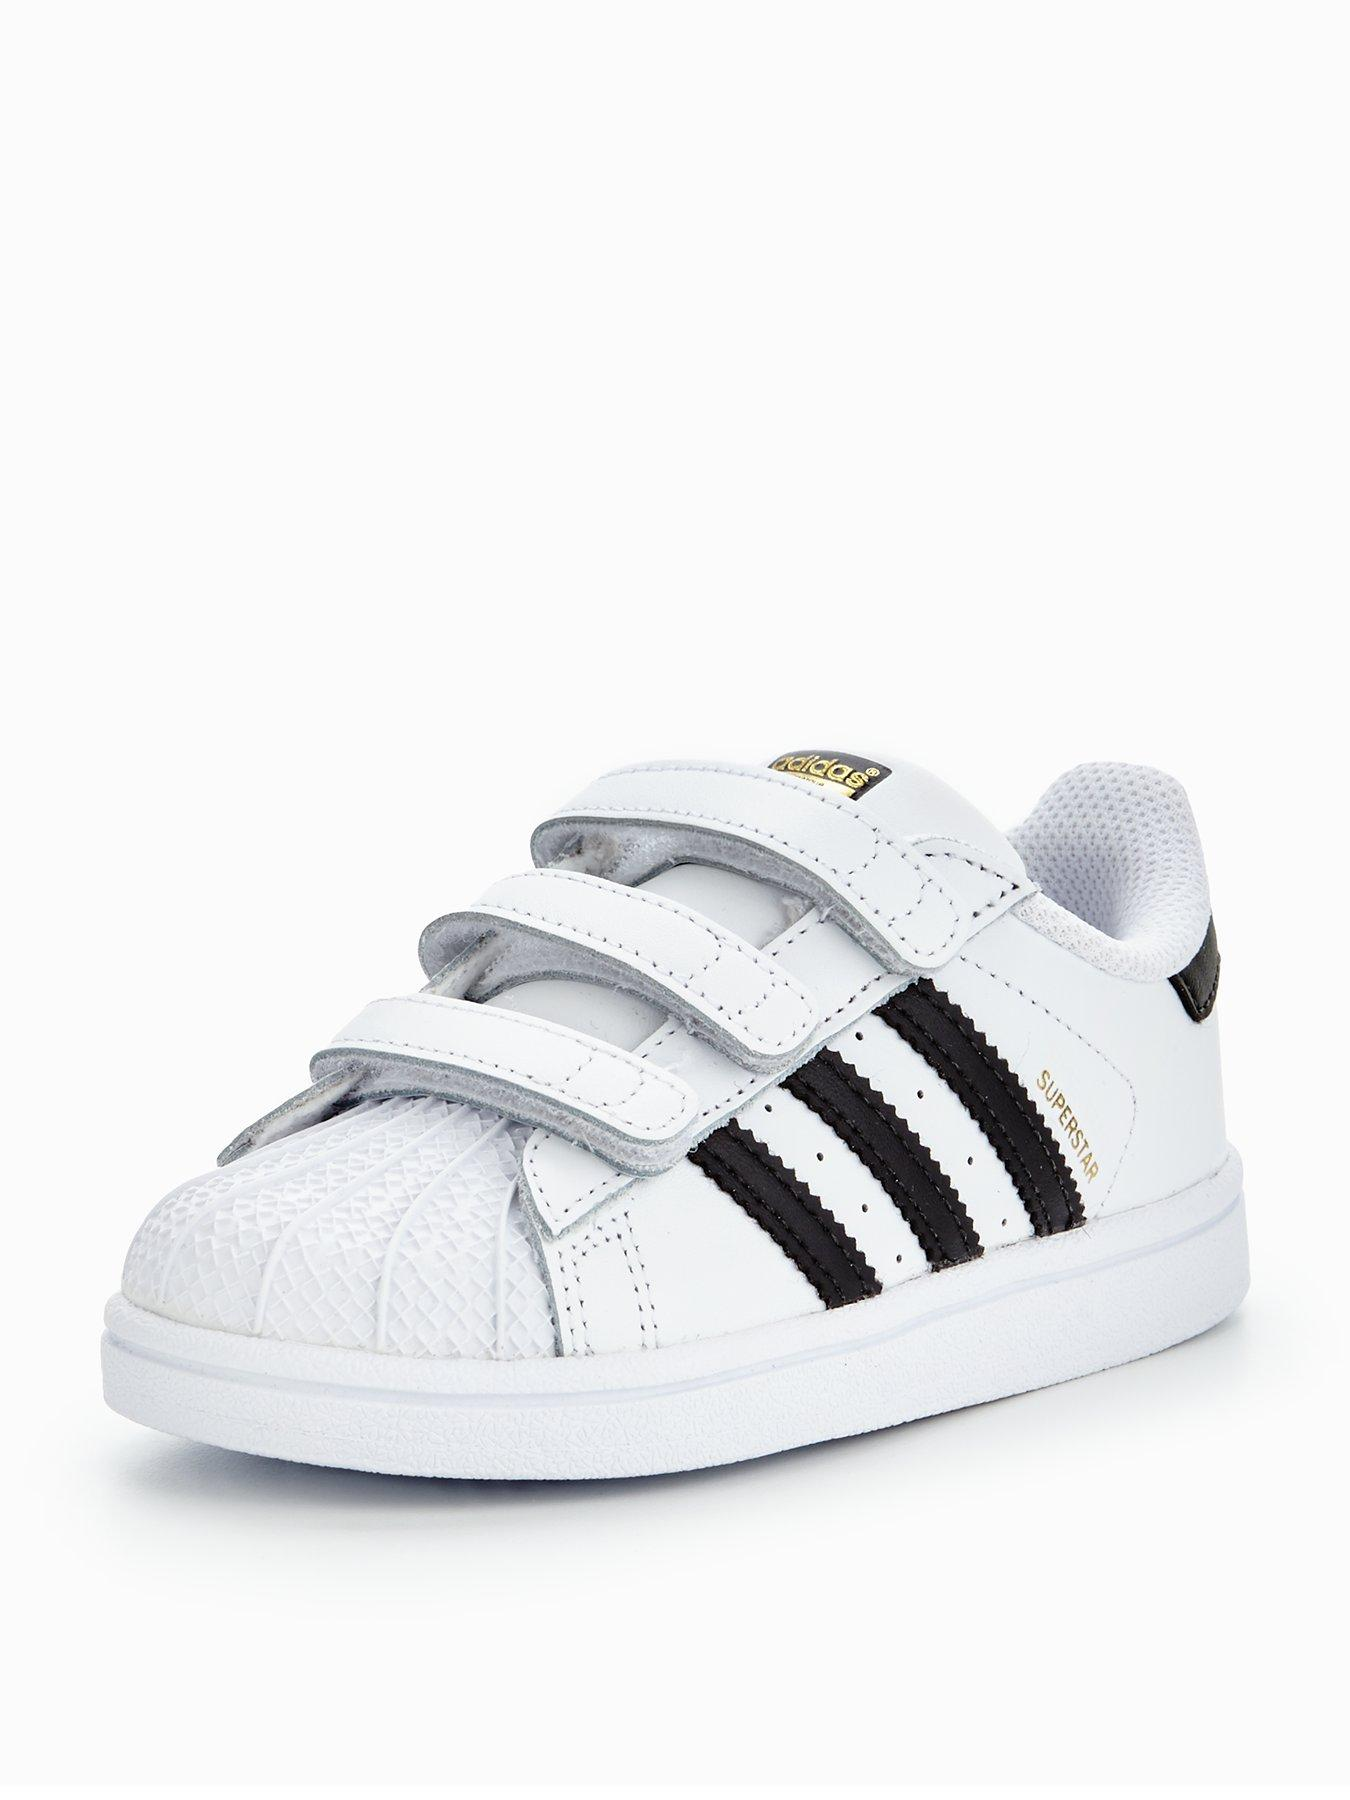 adidas baby superstar